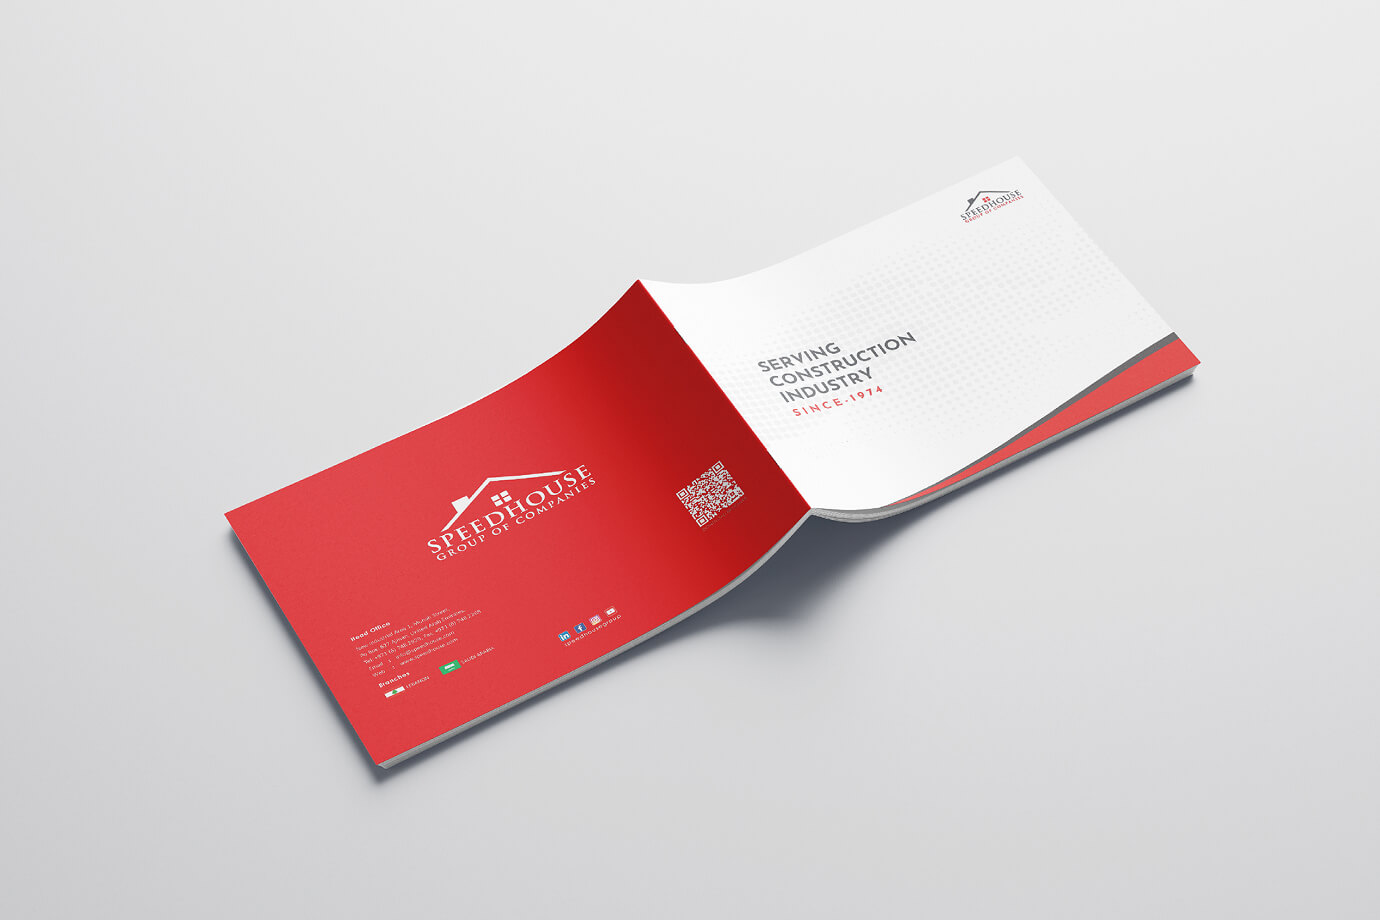 SHG Brochure by SAJID SULAIMAN